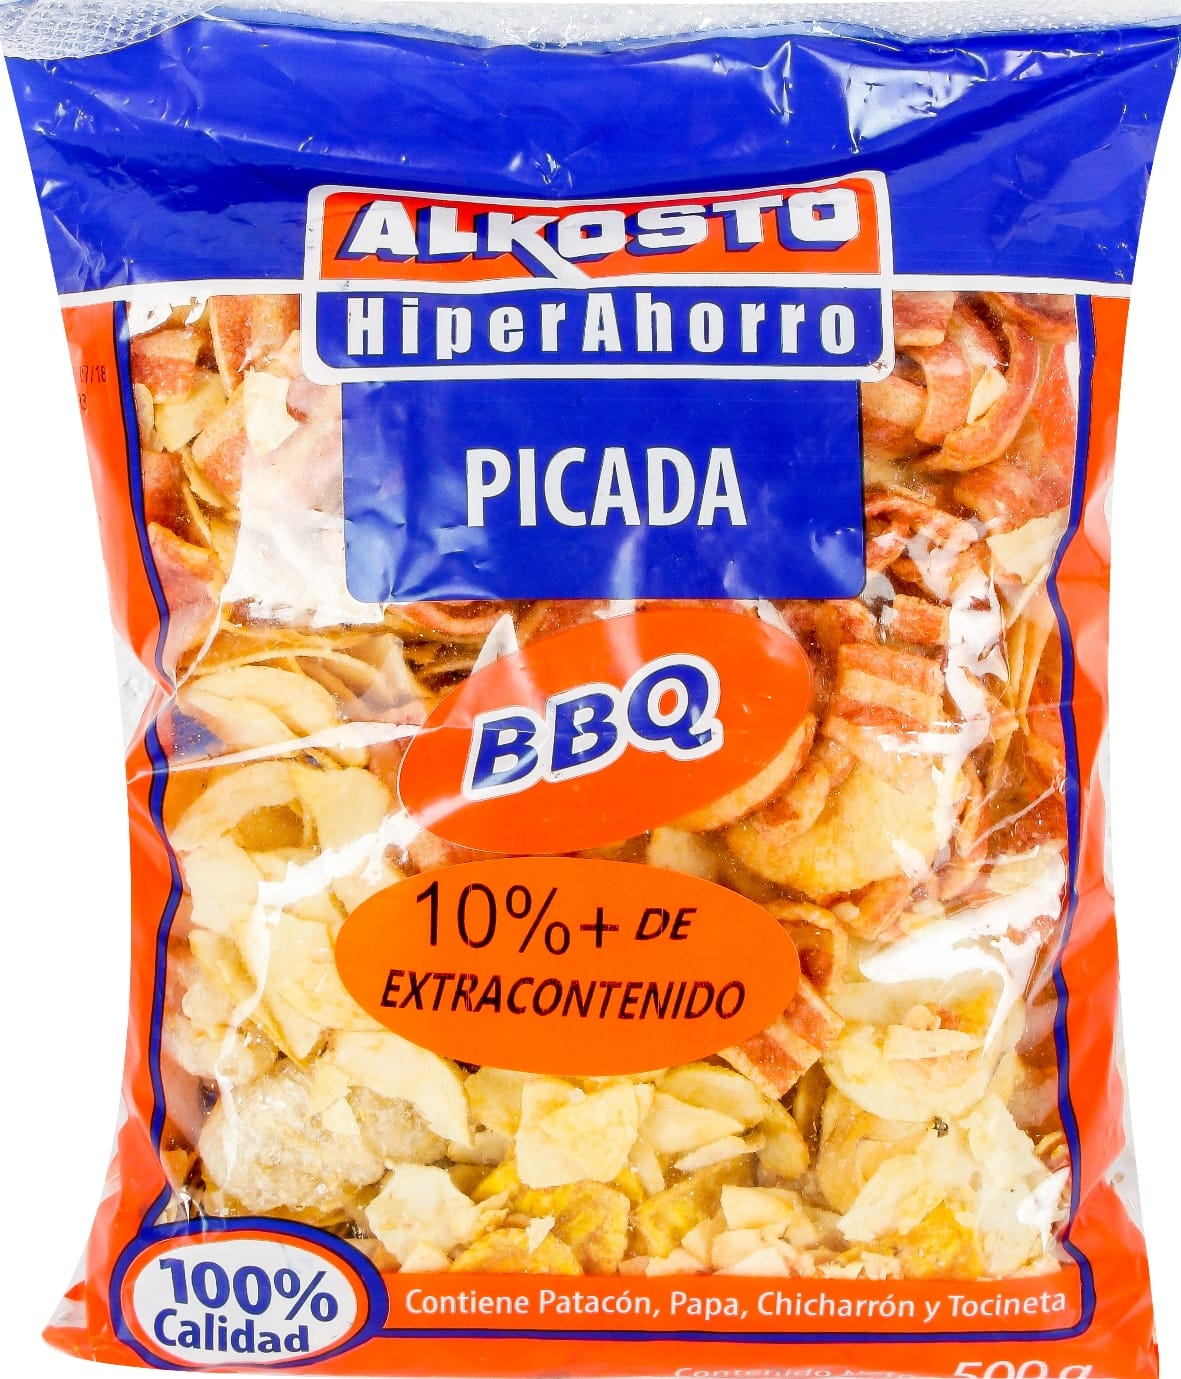 Picada Alkosto bbq 500g 10 Extra Contenido